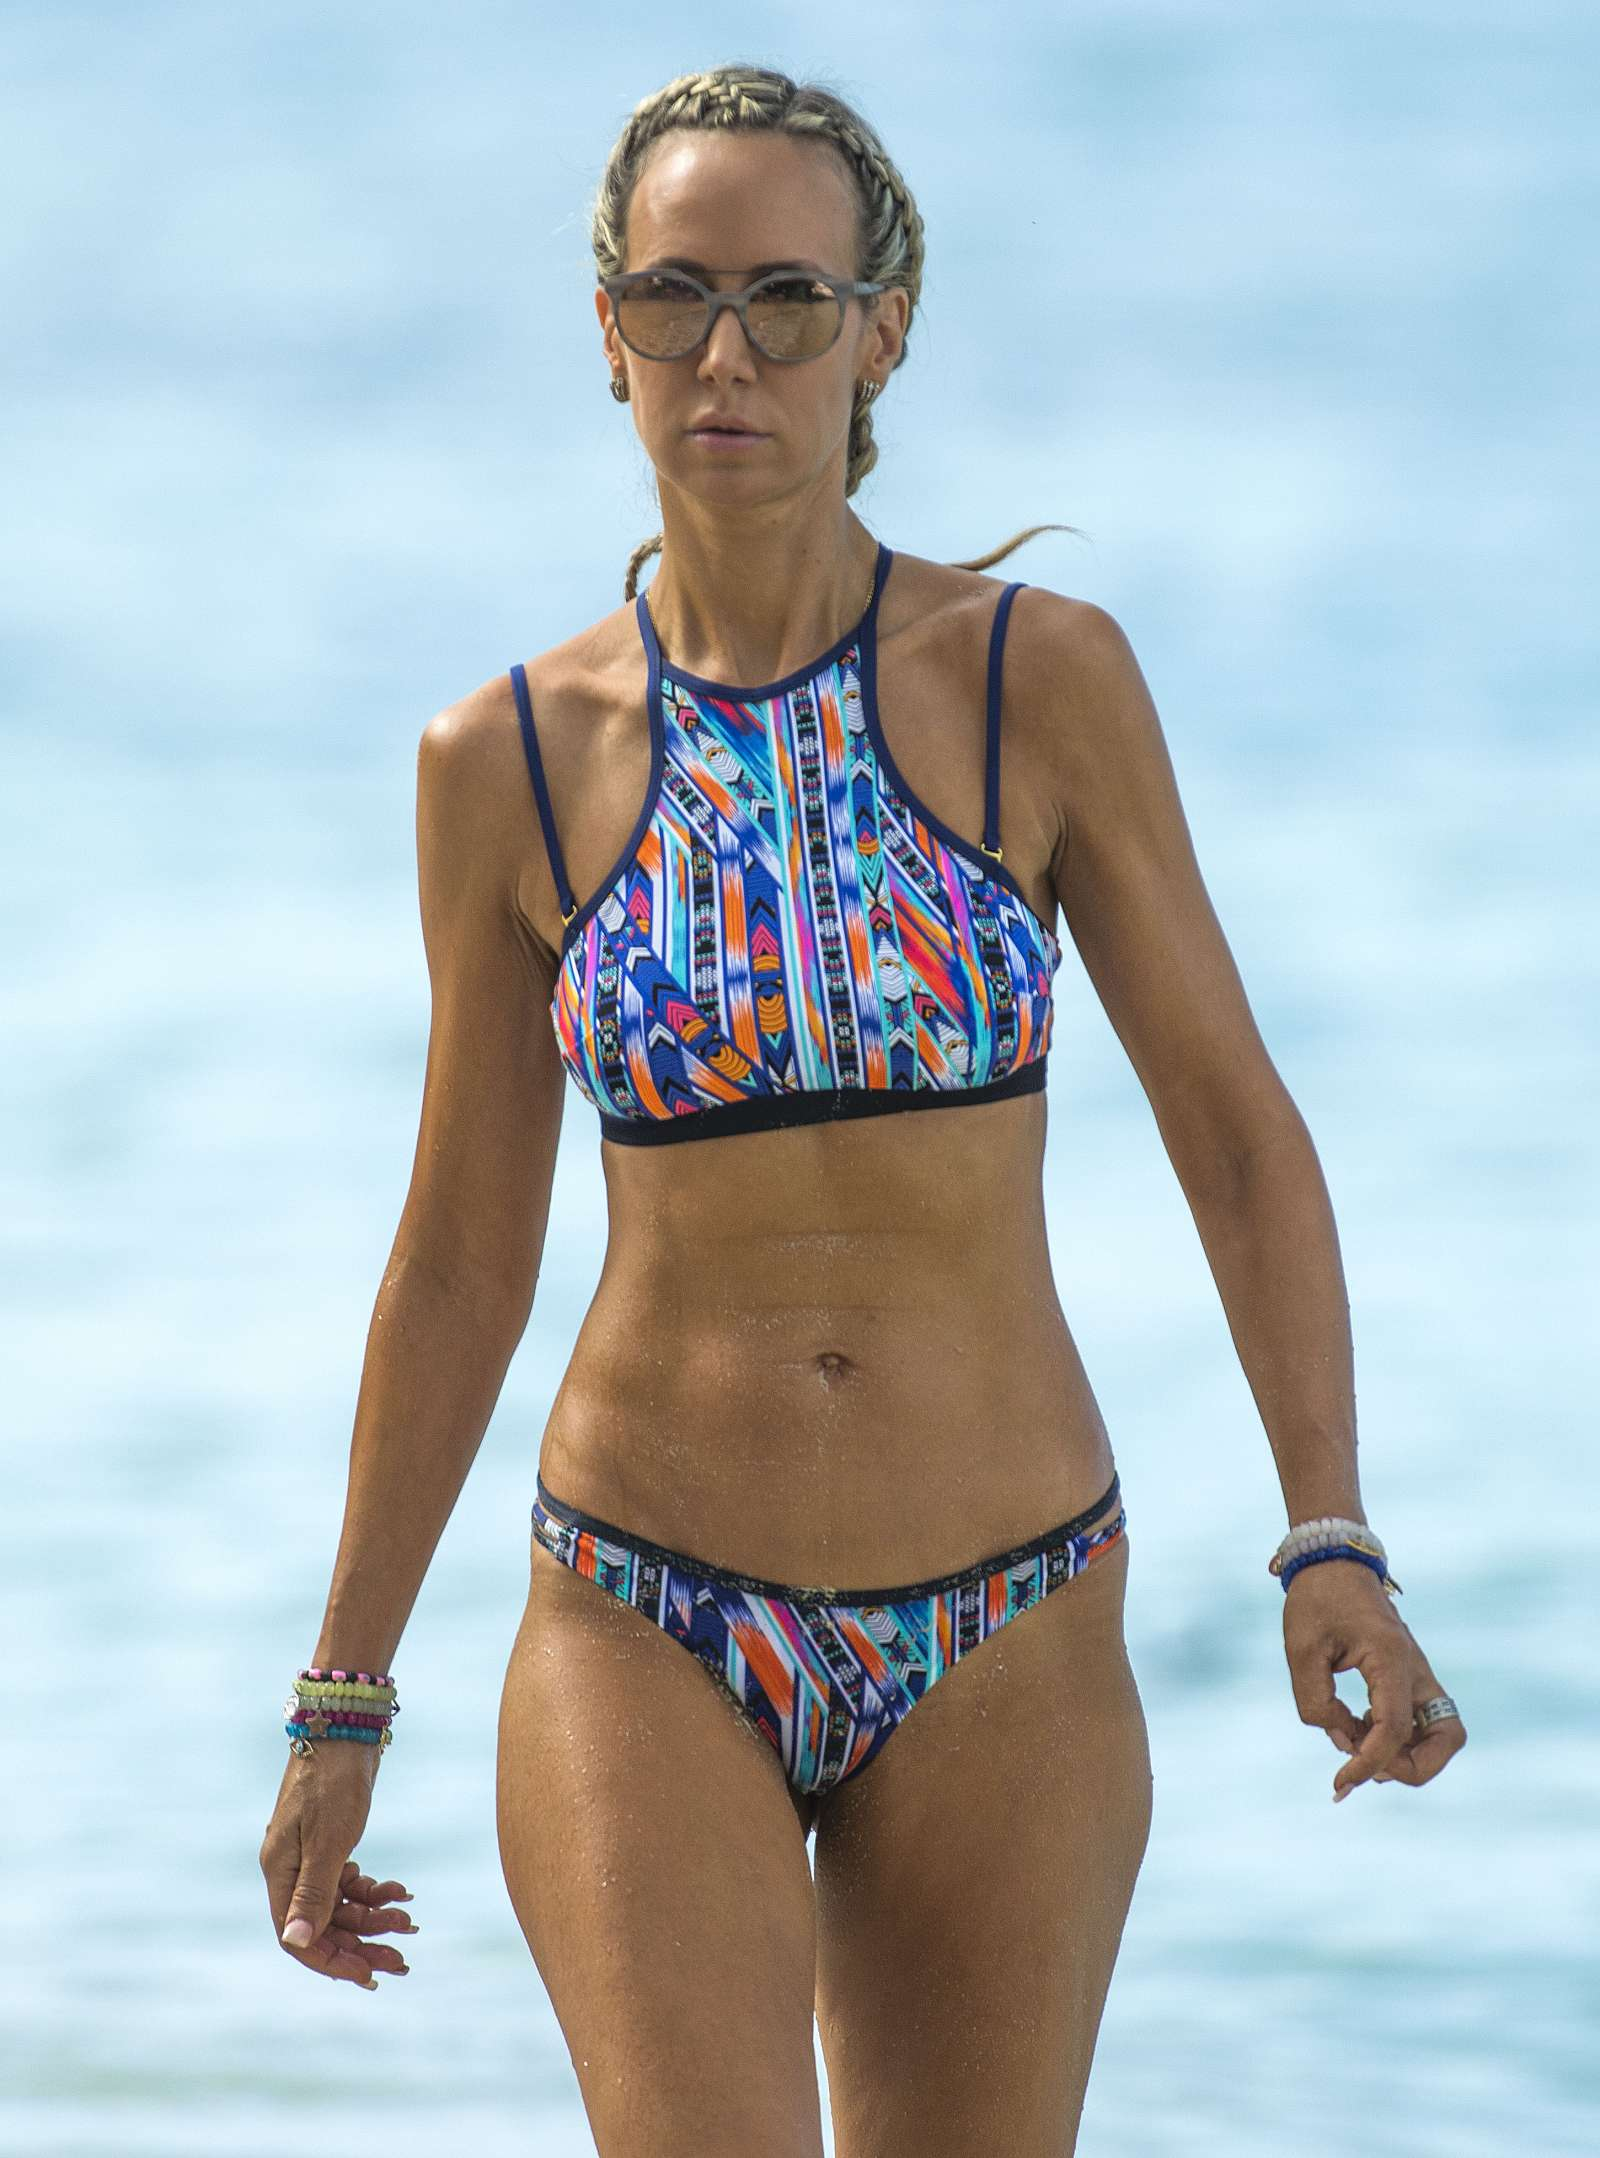 Lady Victoria Hervey in Black Bikini on the beach in Barbados Pic 5 of 35